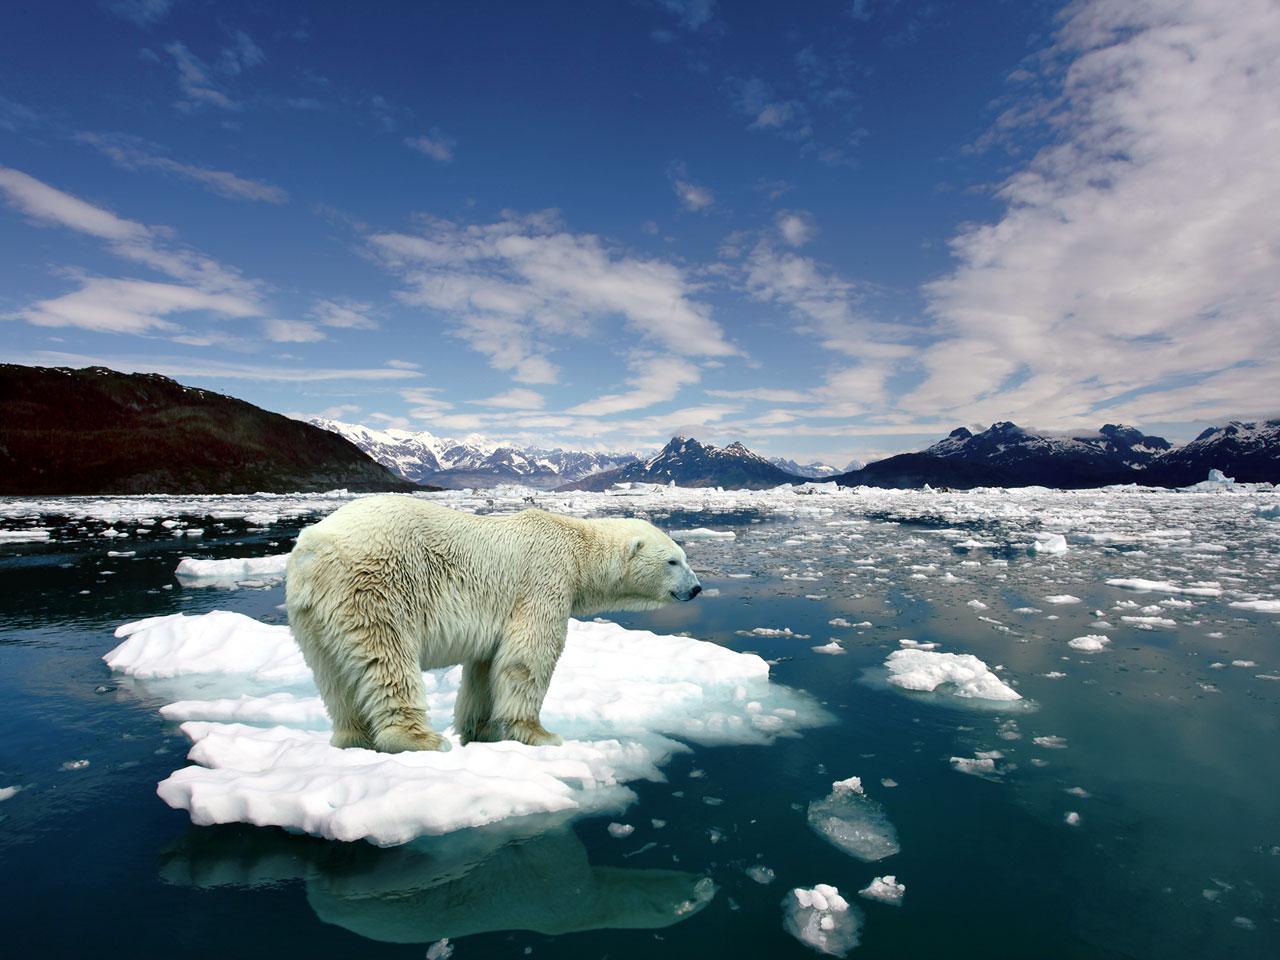 Polar Bear, Ice Melting